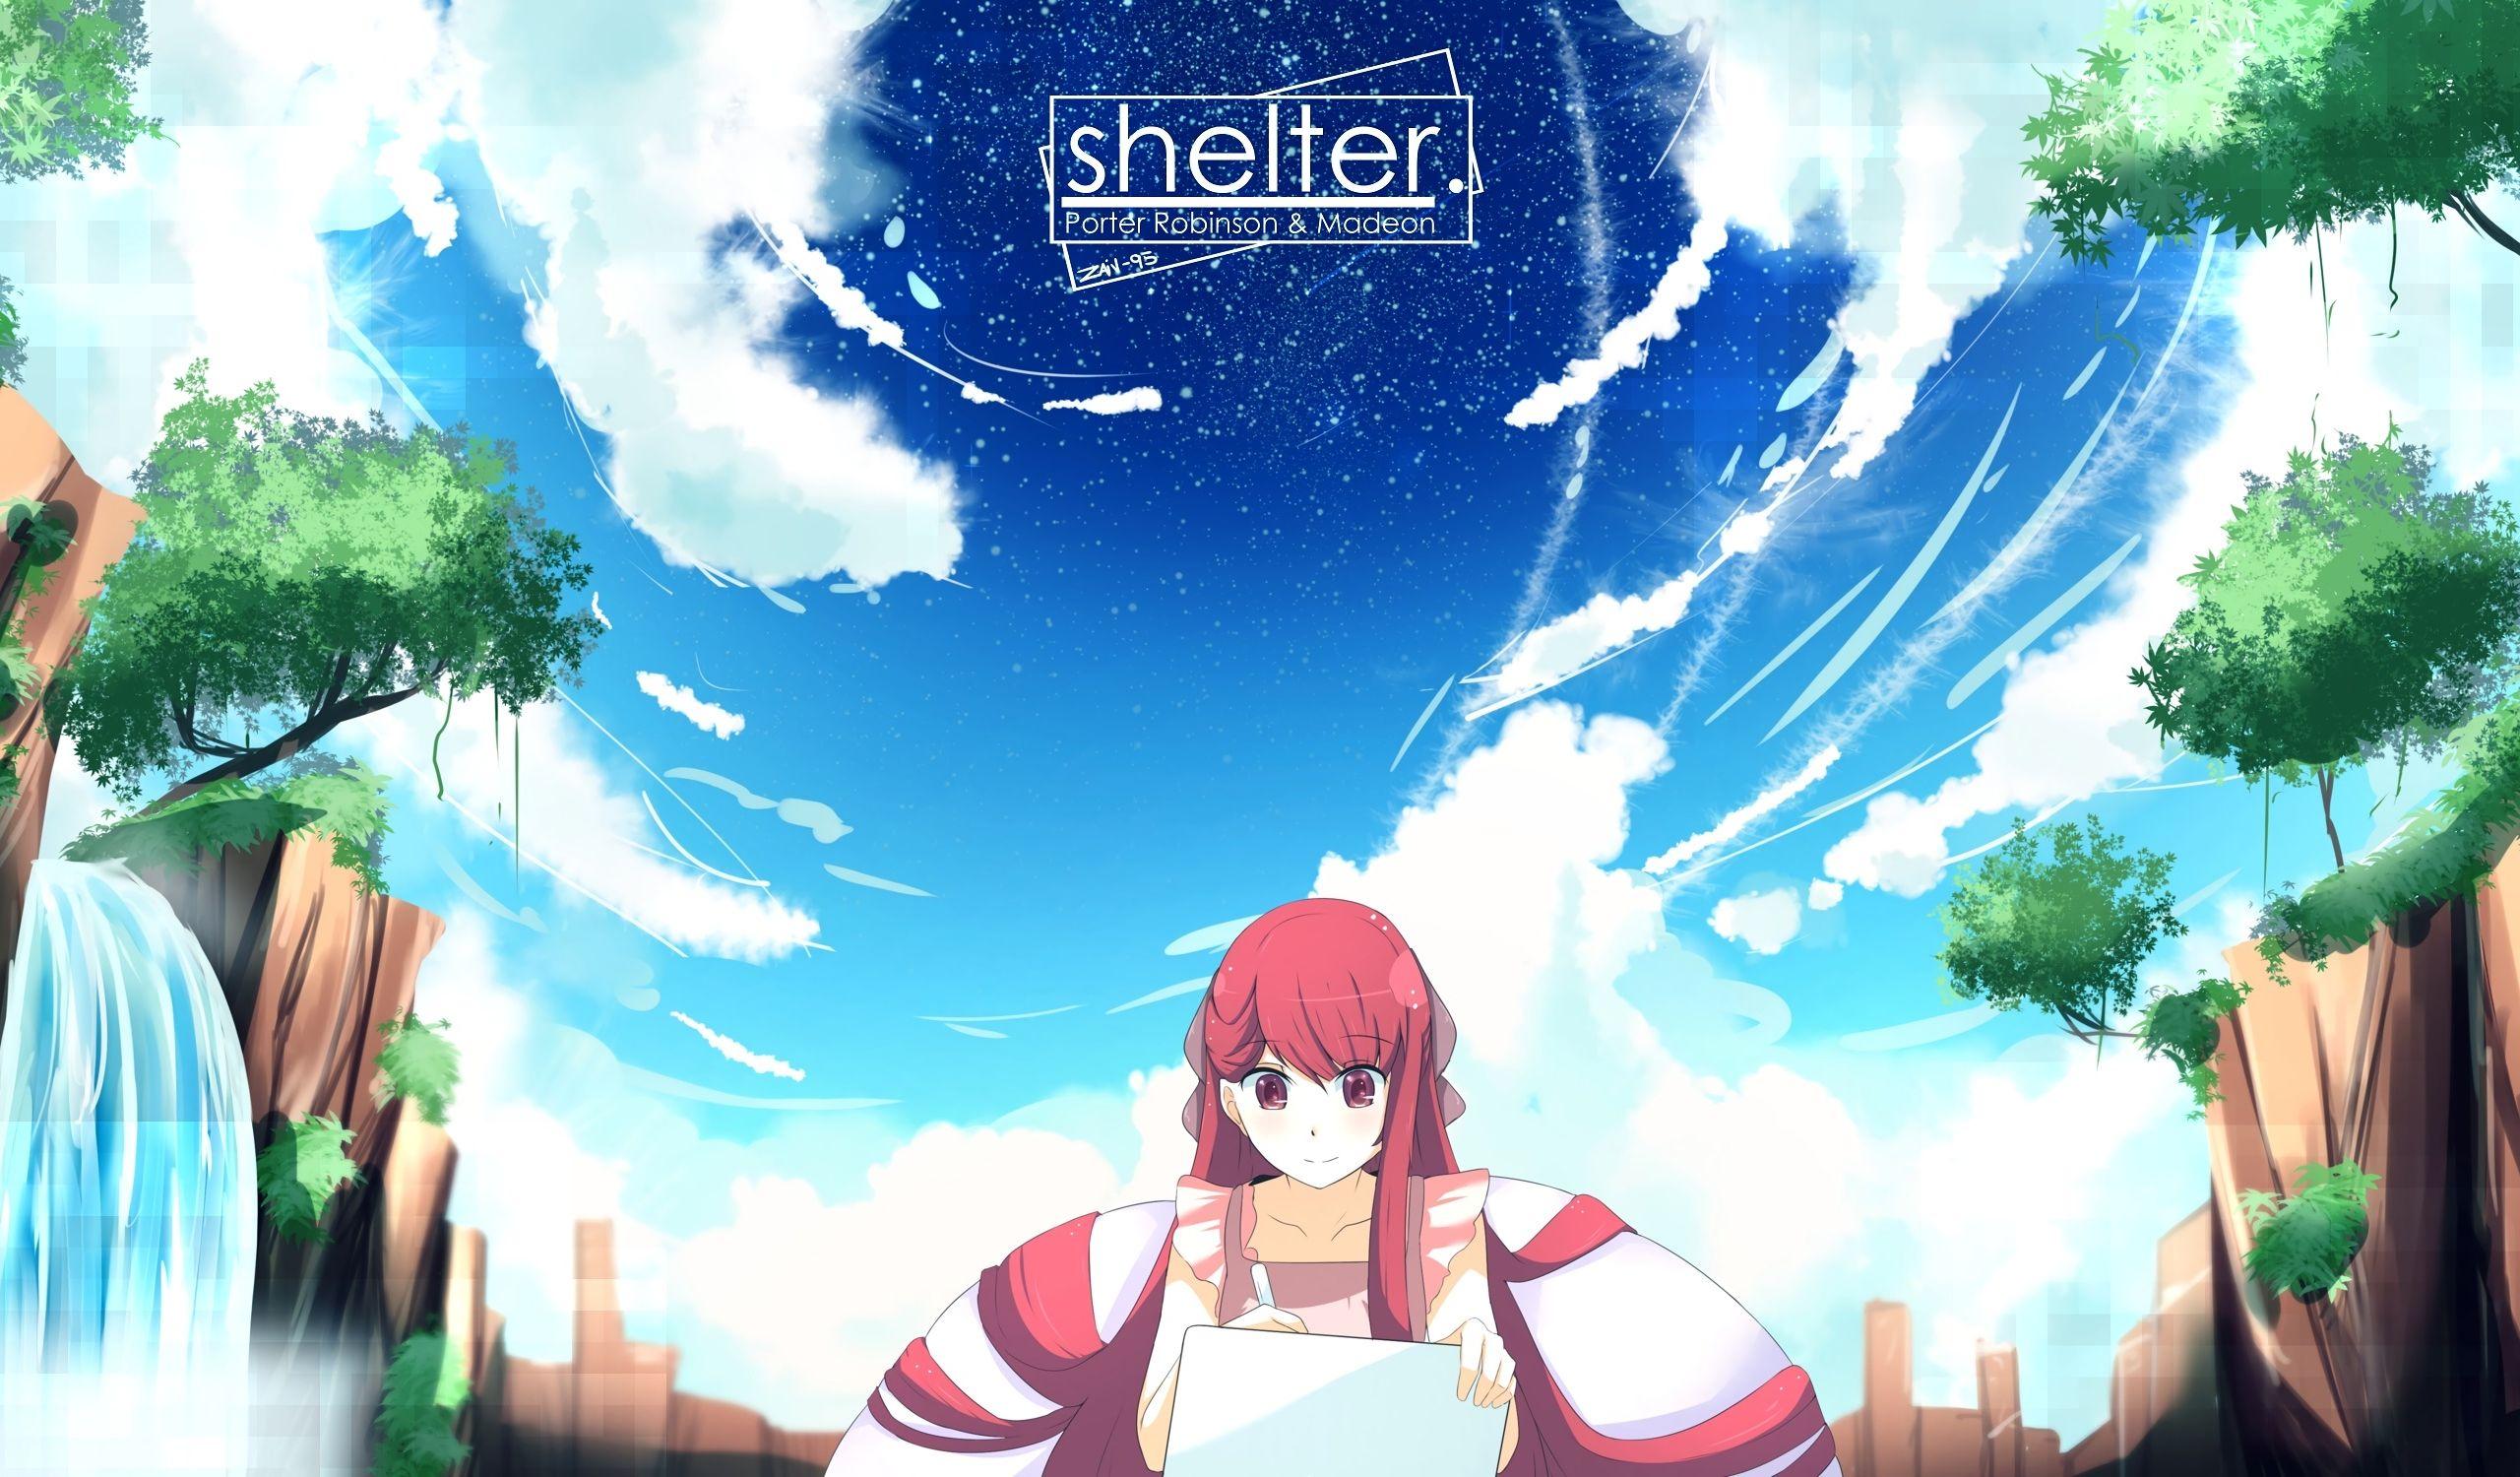 Shelter X Hd Wallpaper From Gallsource Com